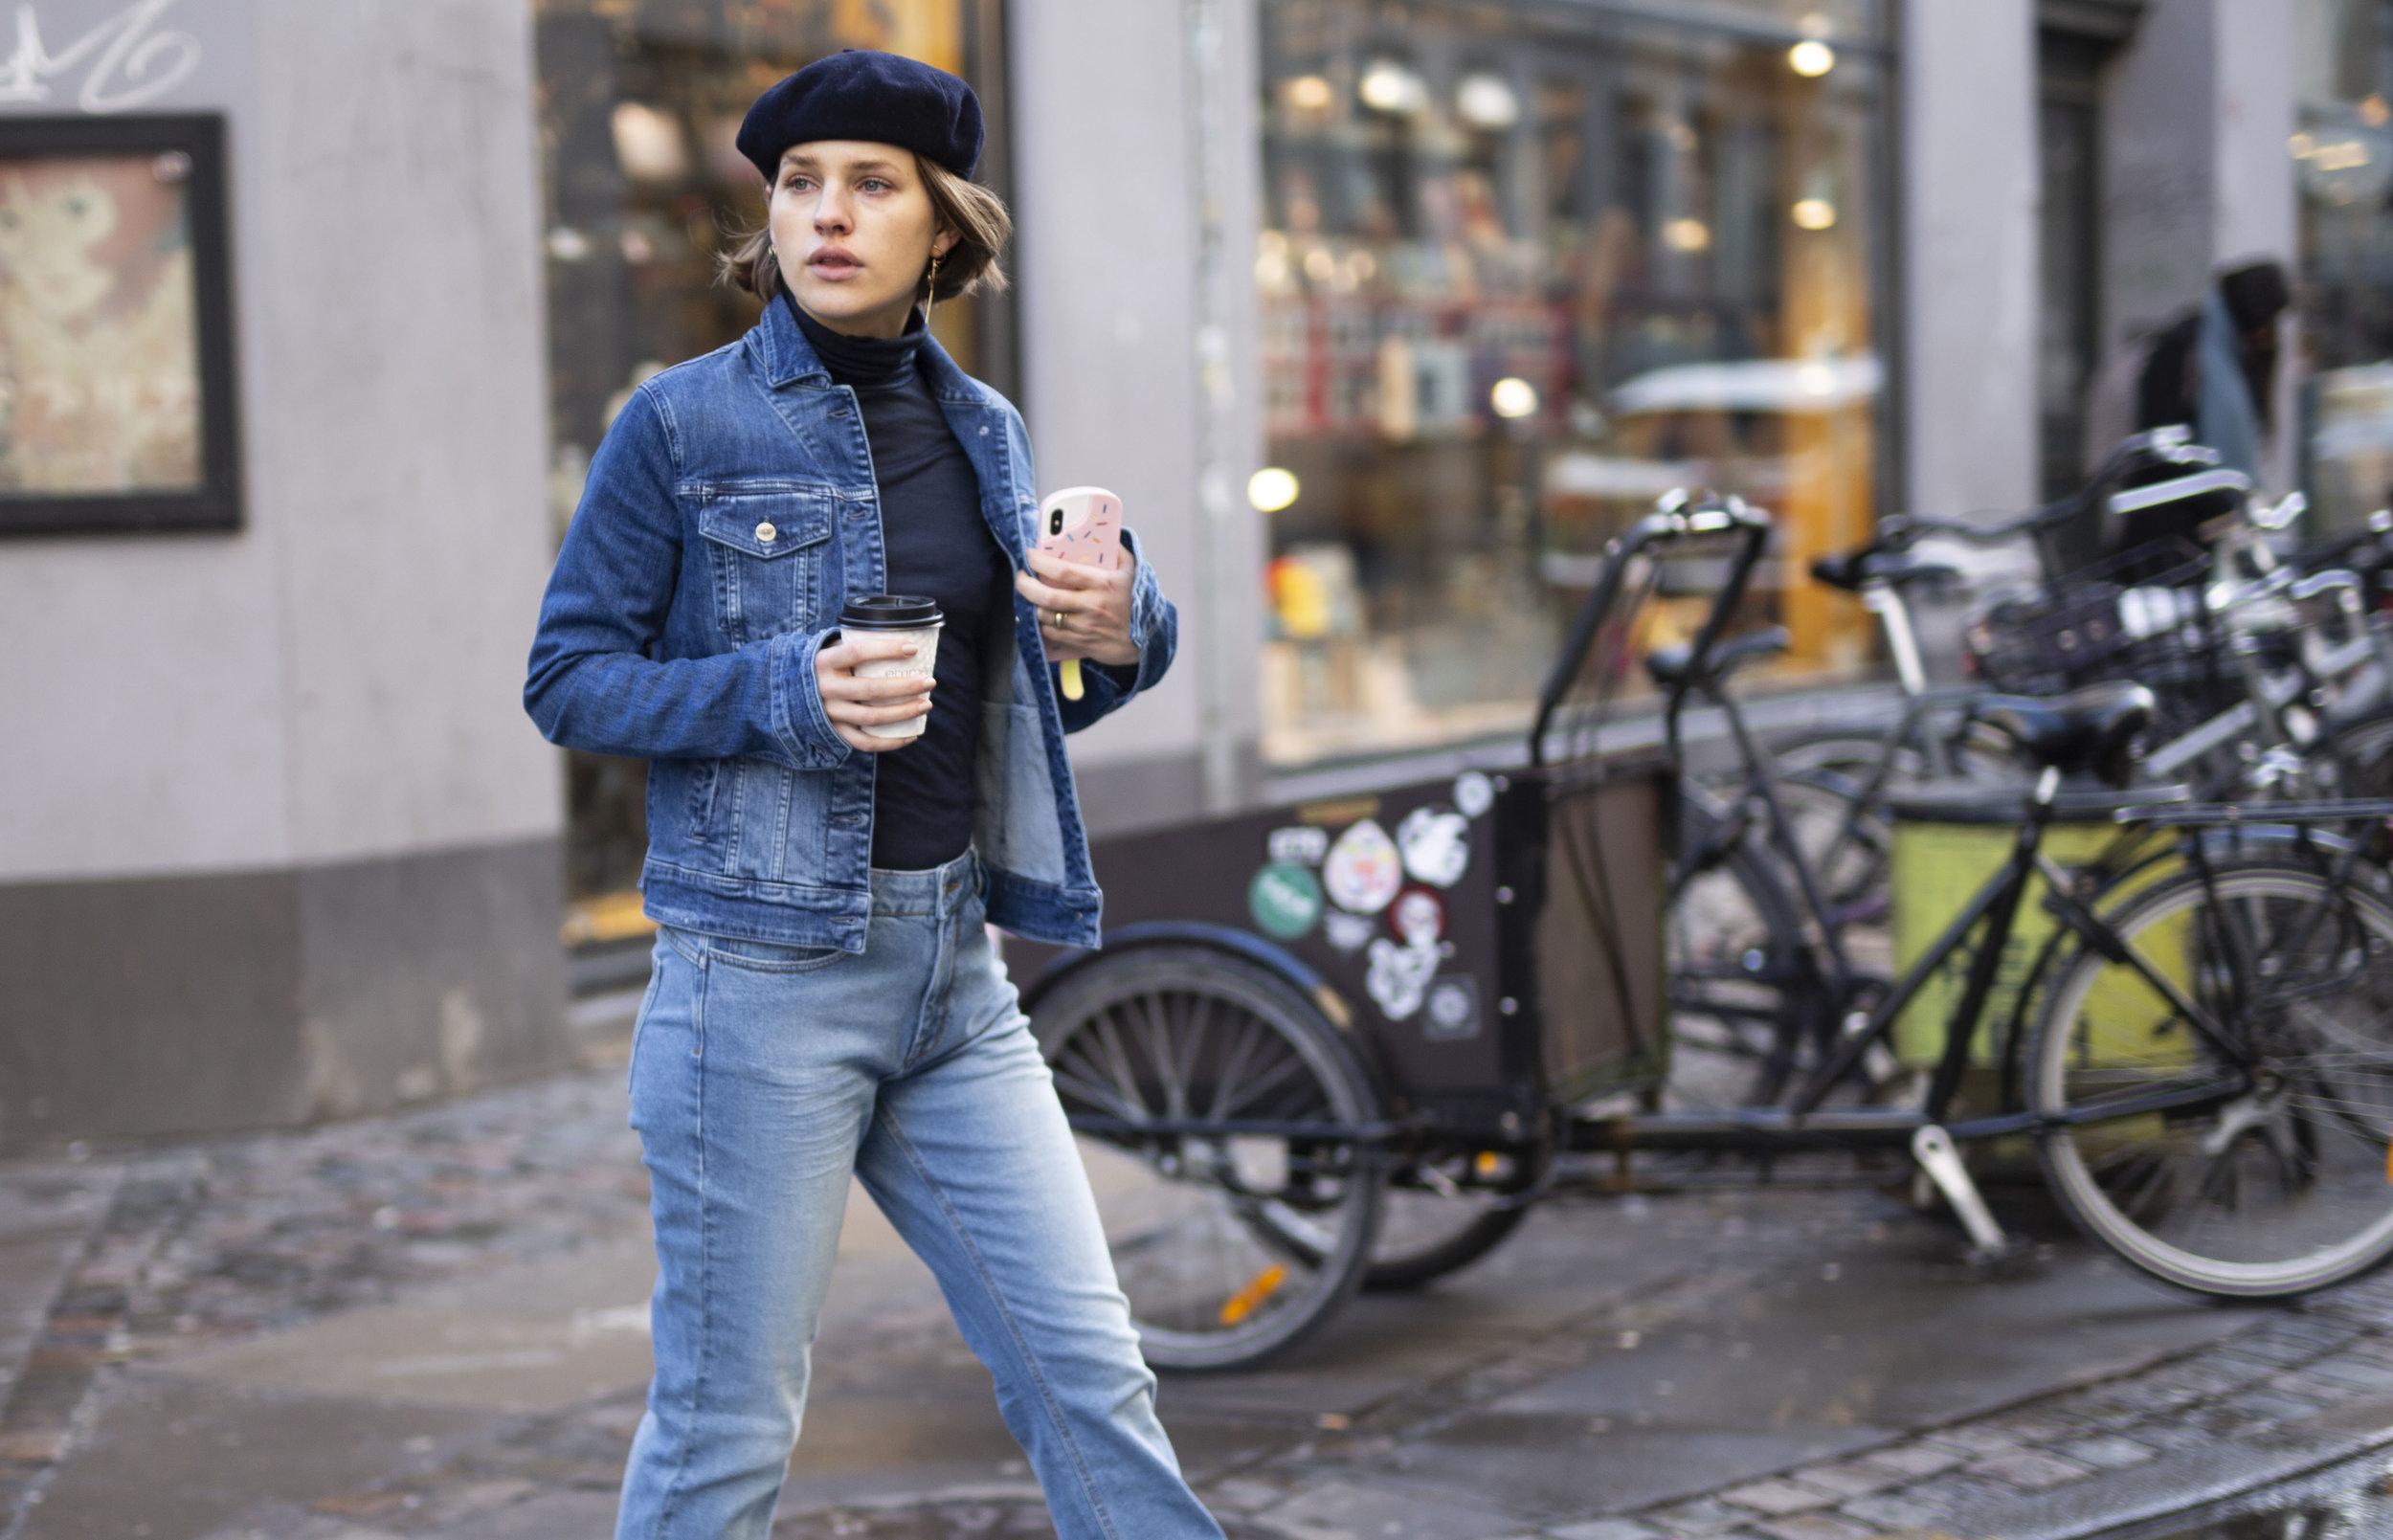 Julie Blichfeld on the streets of Copenhagen wearing a denim set from Denim Hunter with a coffee togo